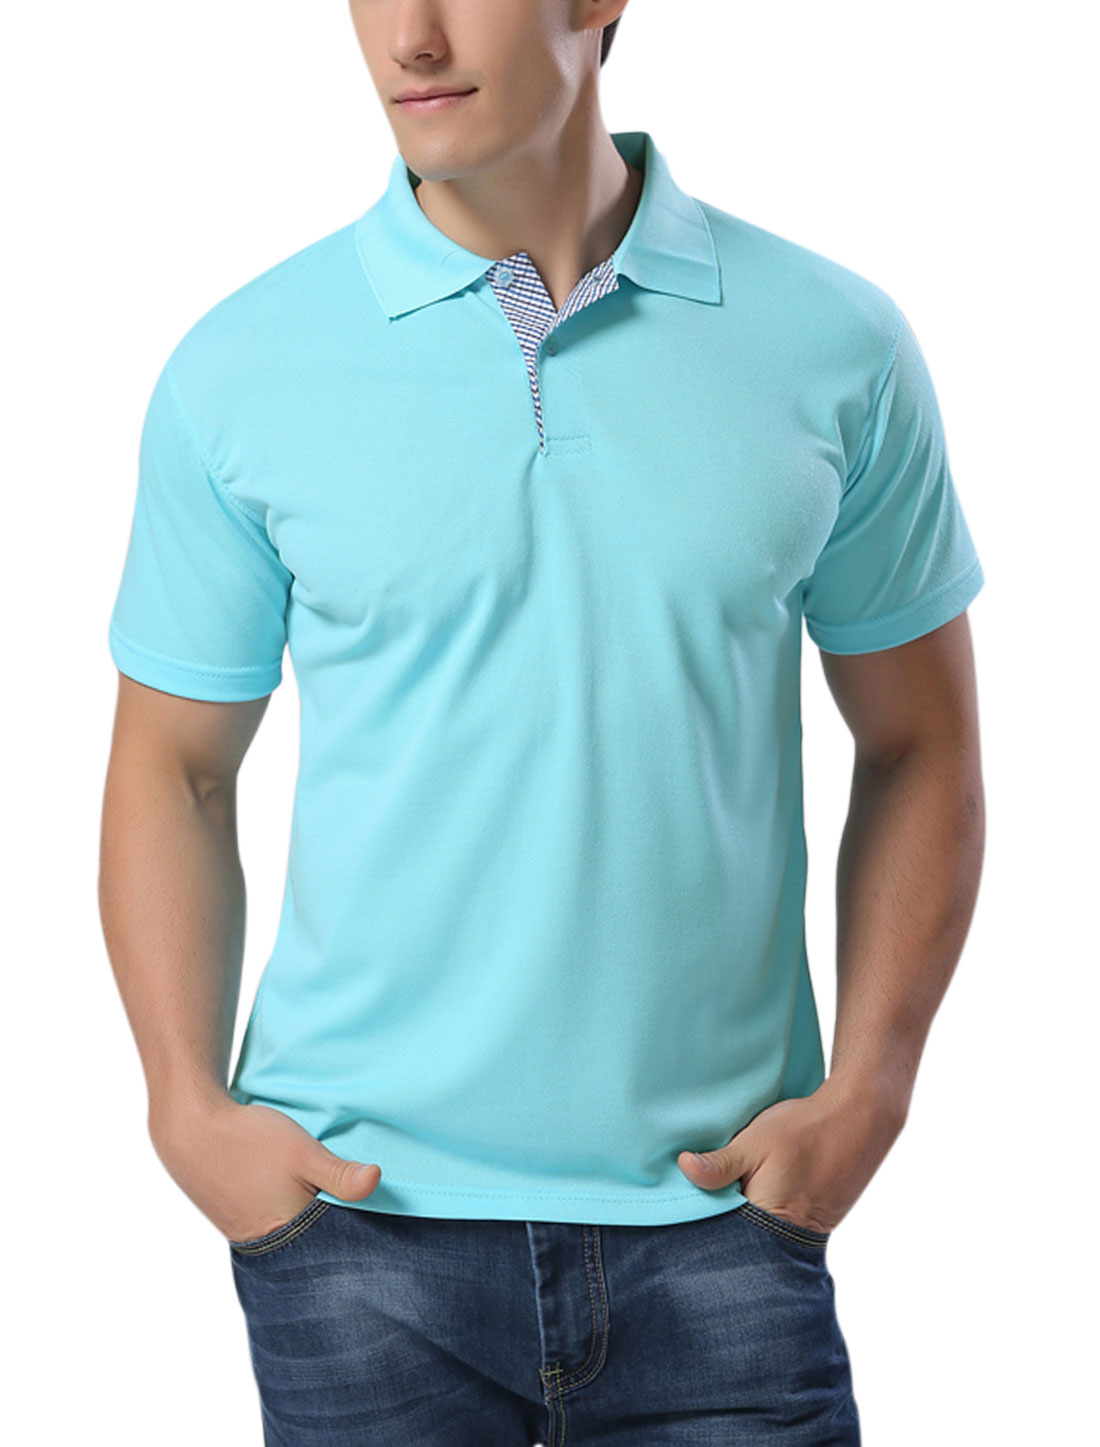 Men Point Collar Short Sleeves Uniform Polo Shirts Aqua M